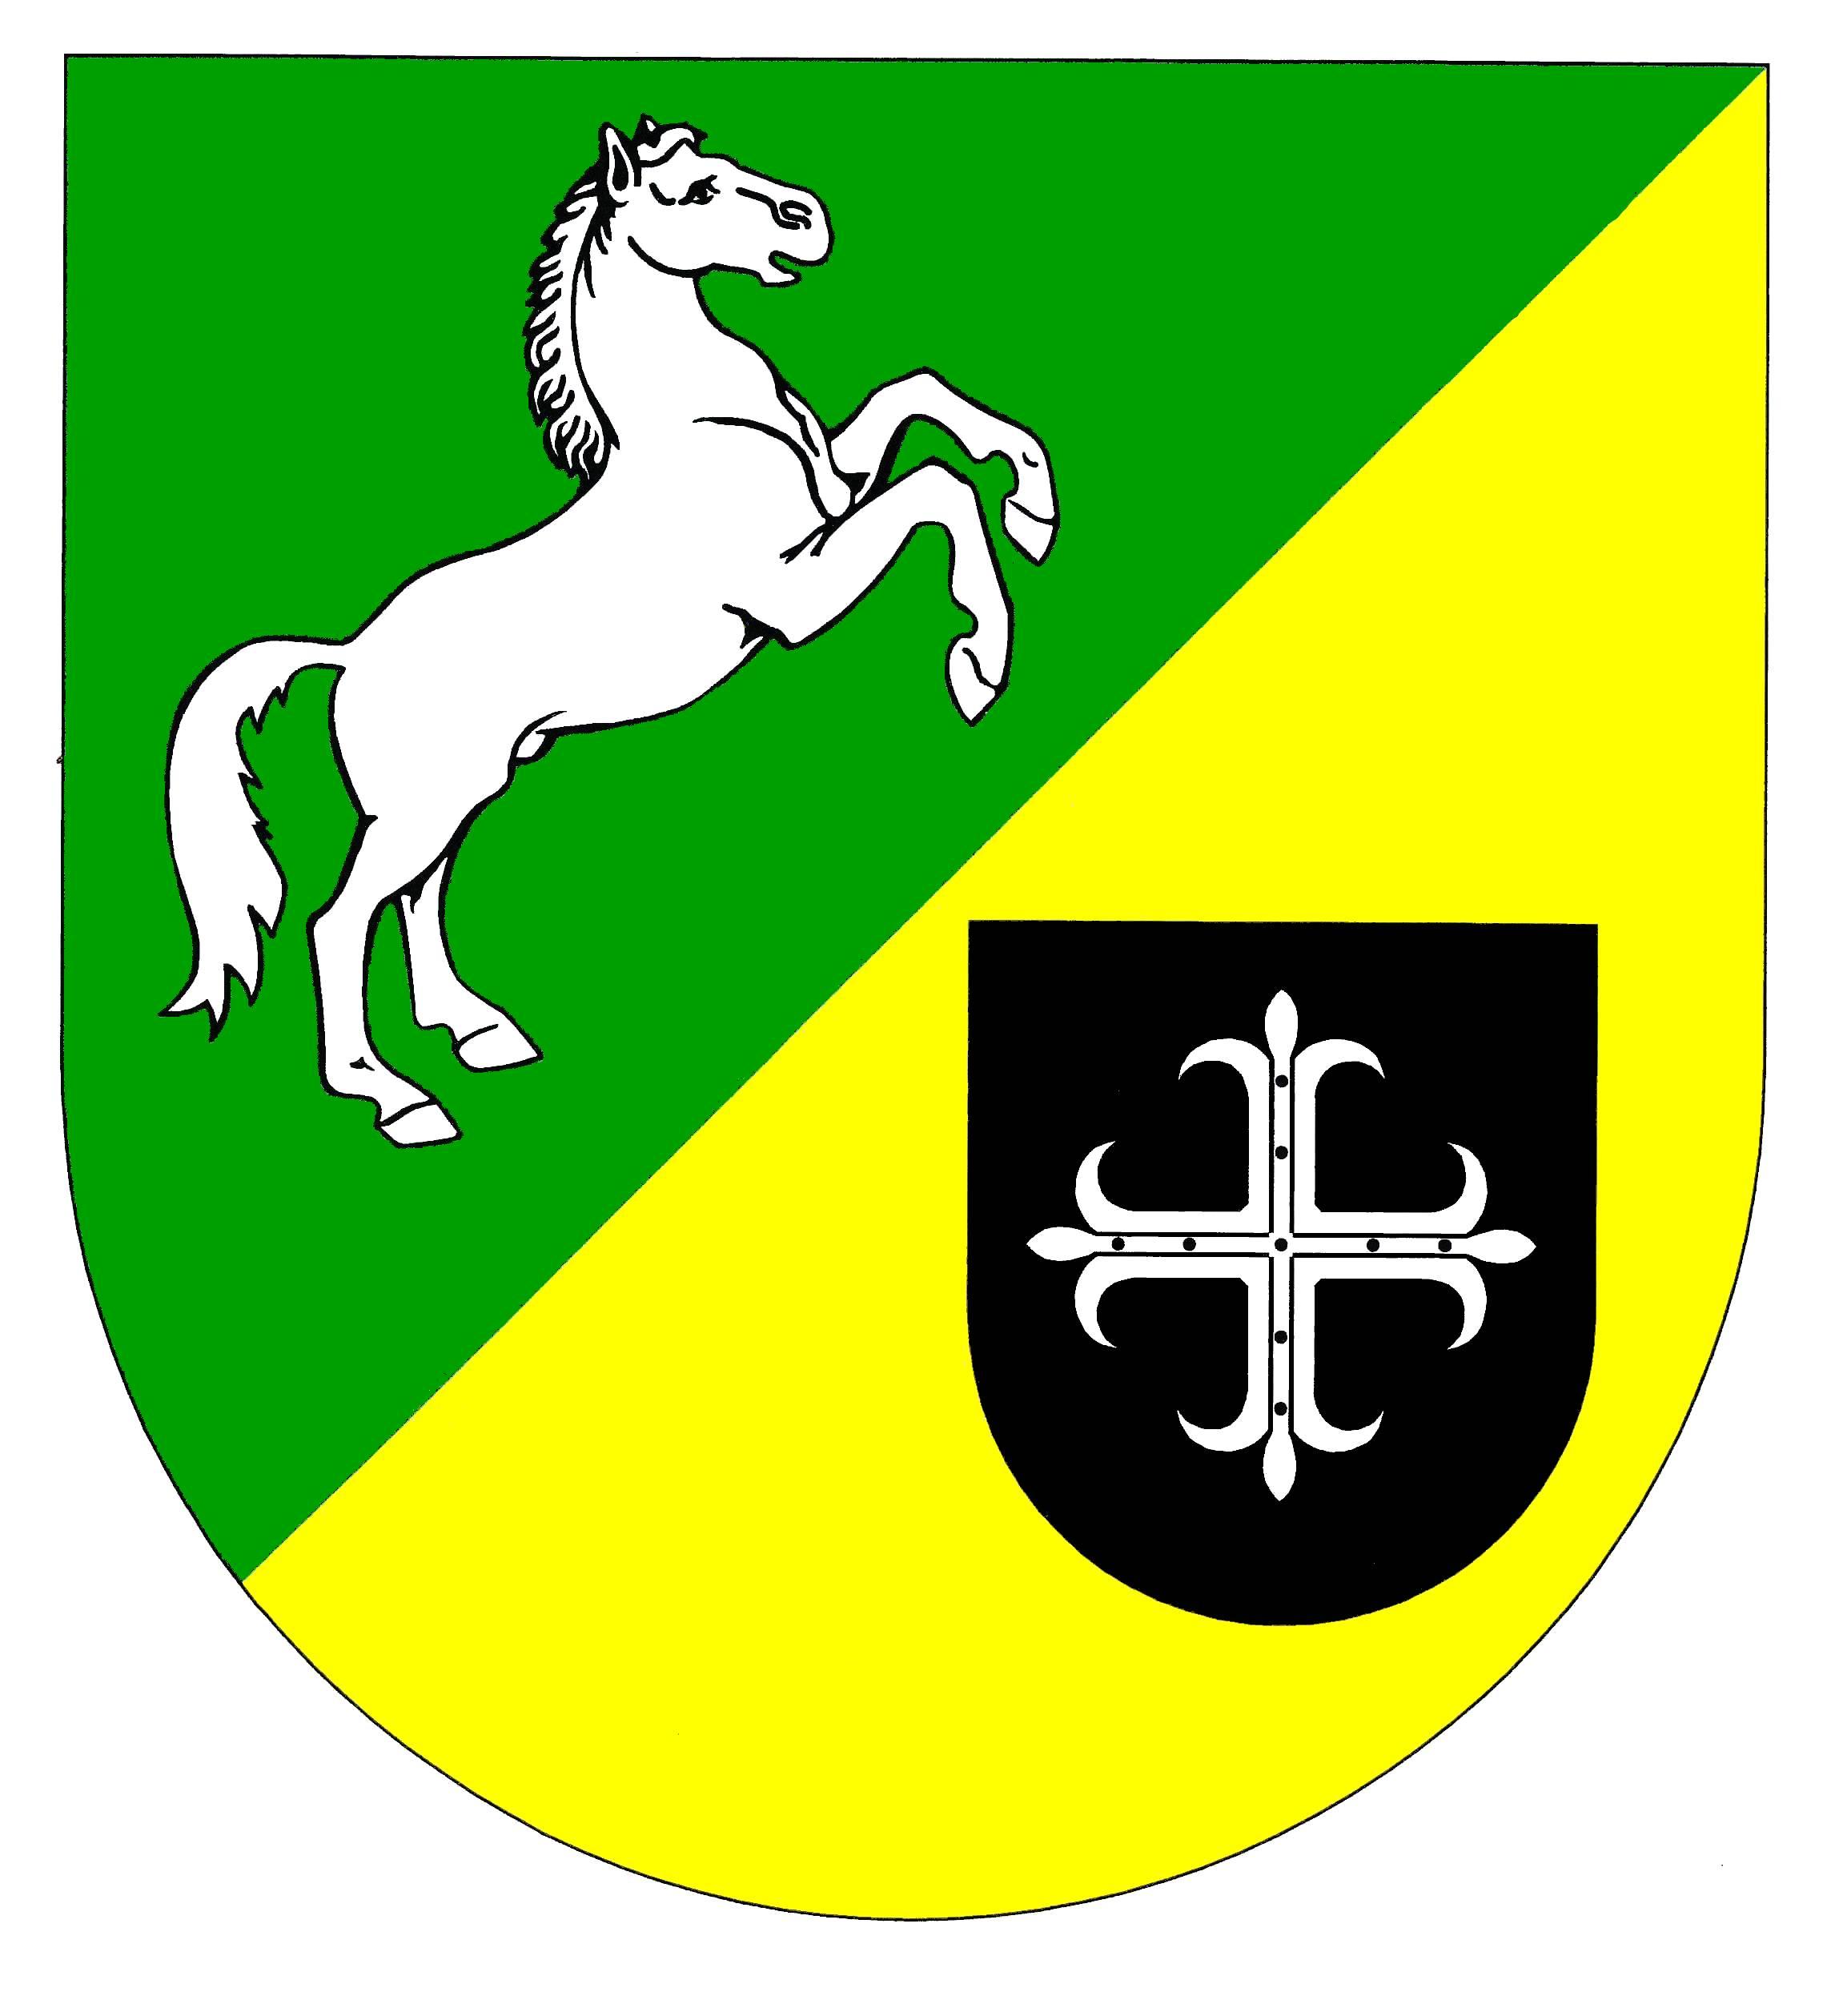 Wappen GemeindeBadendorf, Kreis Stormarn